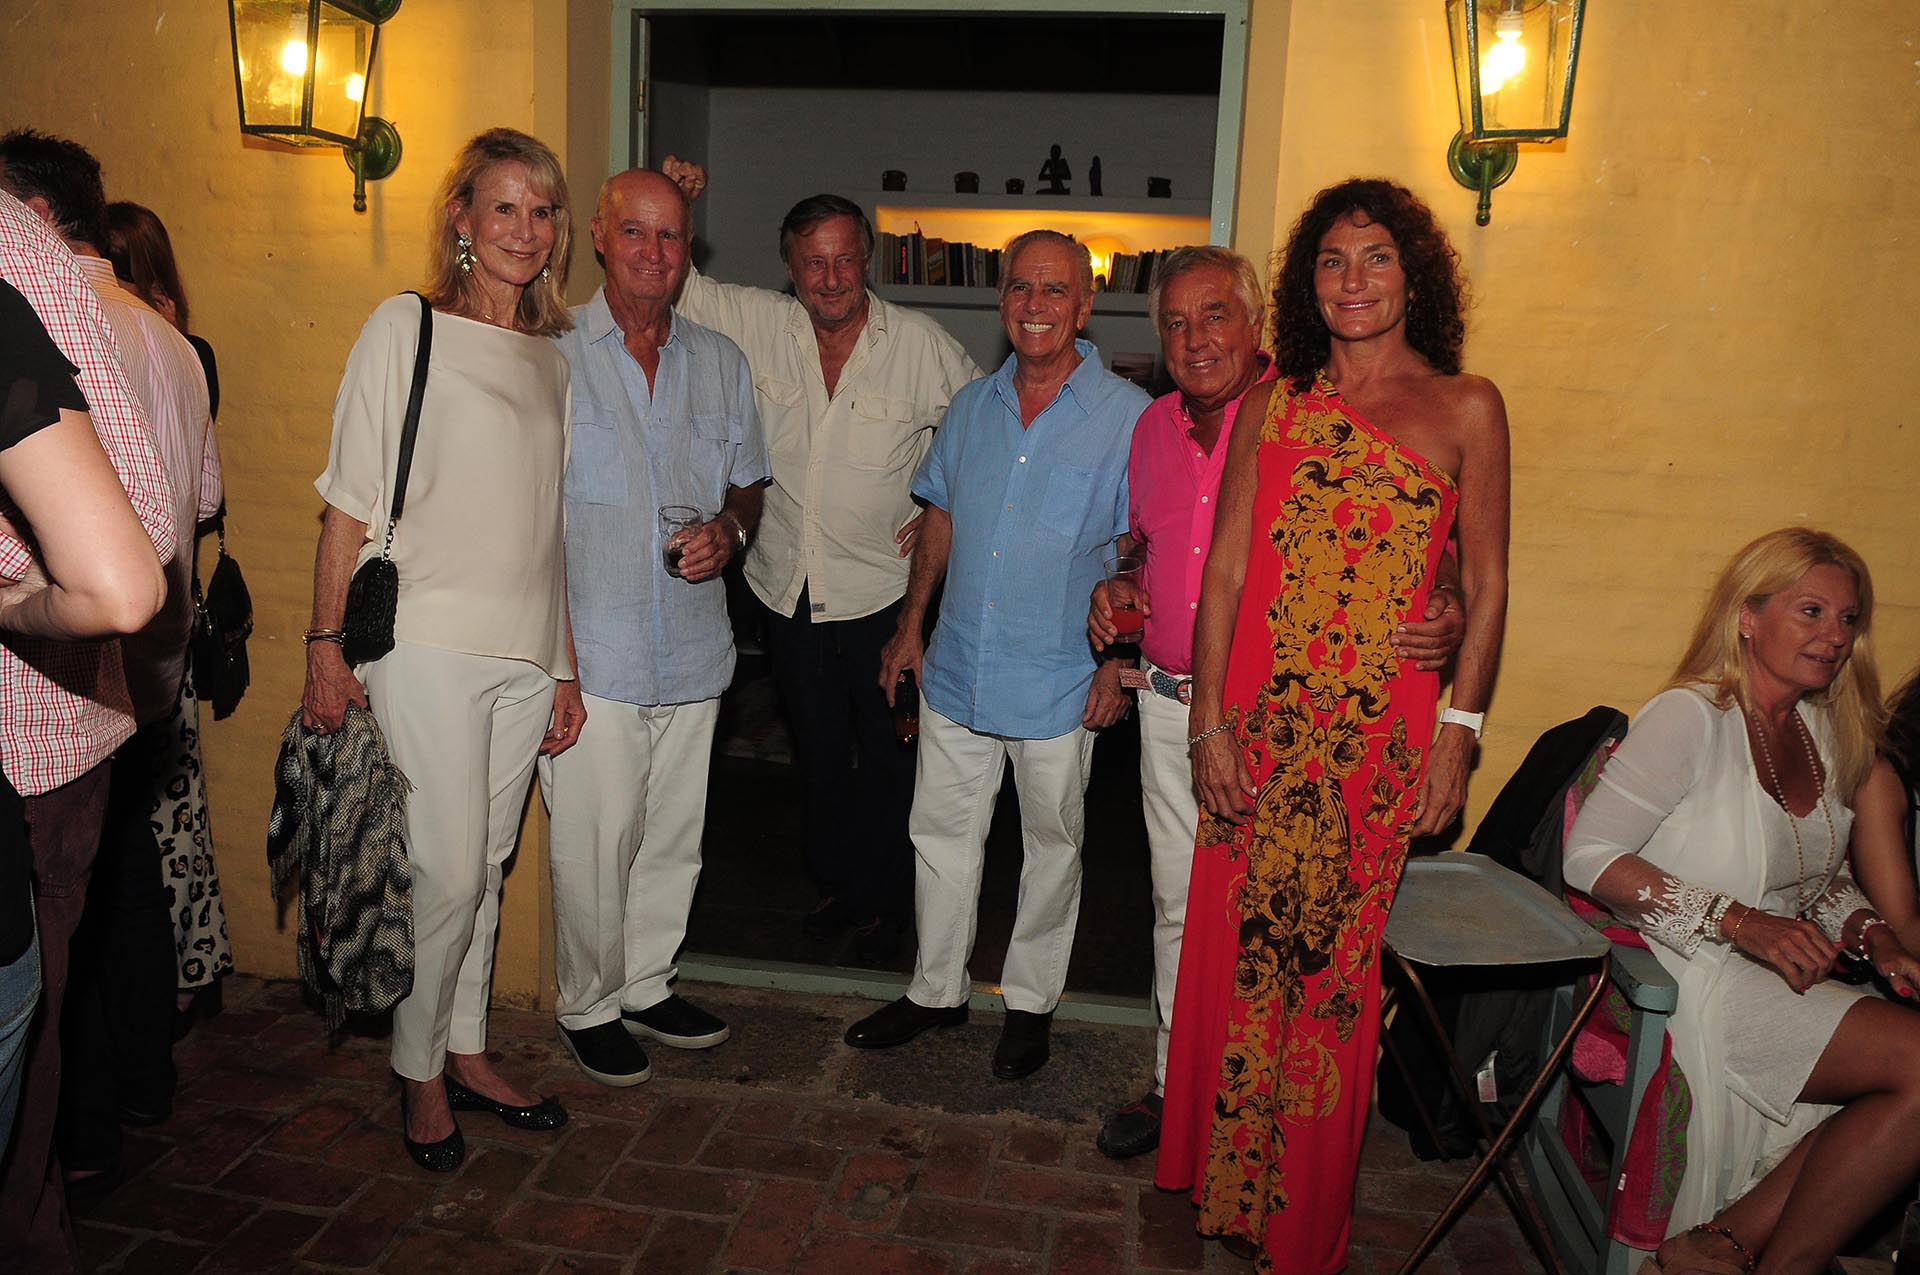 Pompi Chopitea, Carlos Fontán Balestra, Cristiano Rattazzi, Alejandro Bulgheroni, Julio De Marco y Alejandra Stefani